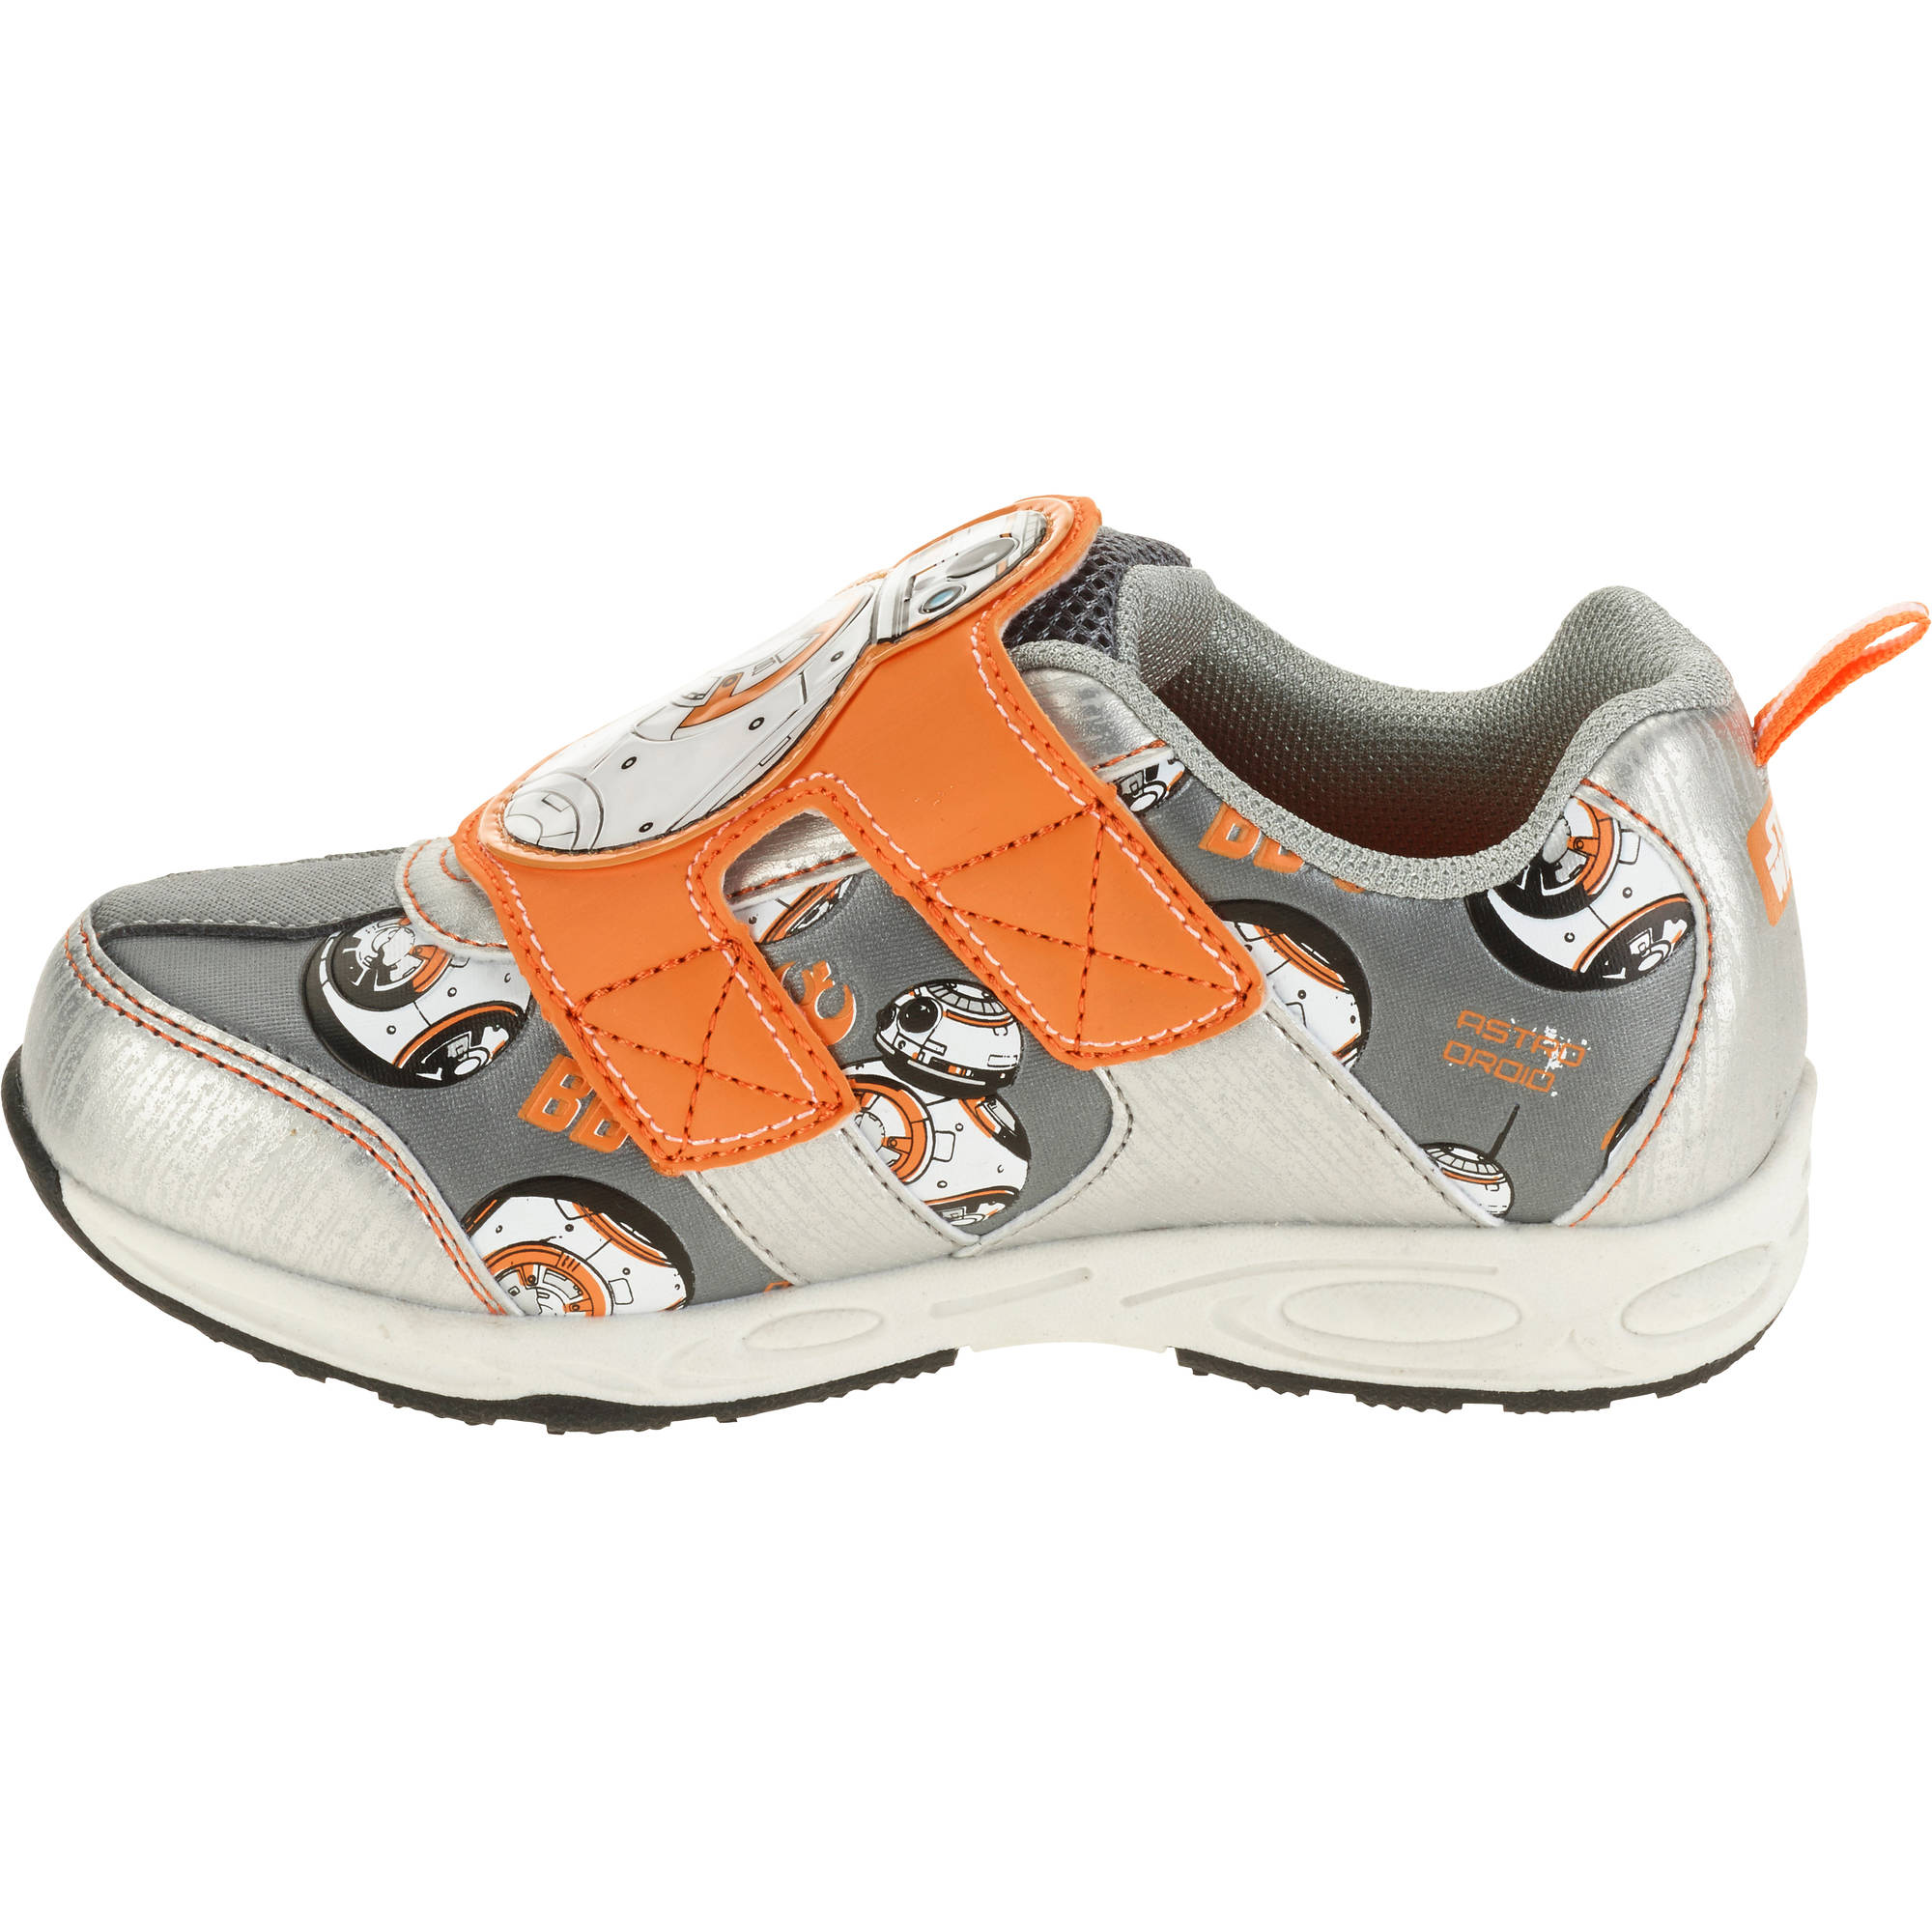 Toddler Boys Athletic Shoe Walmart